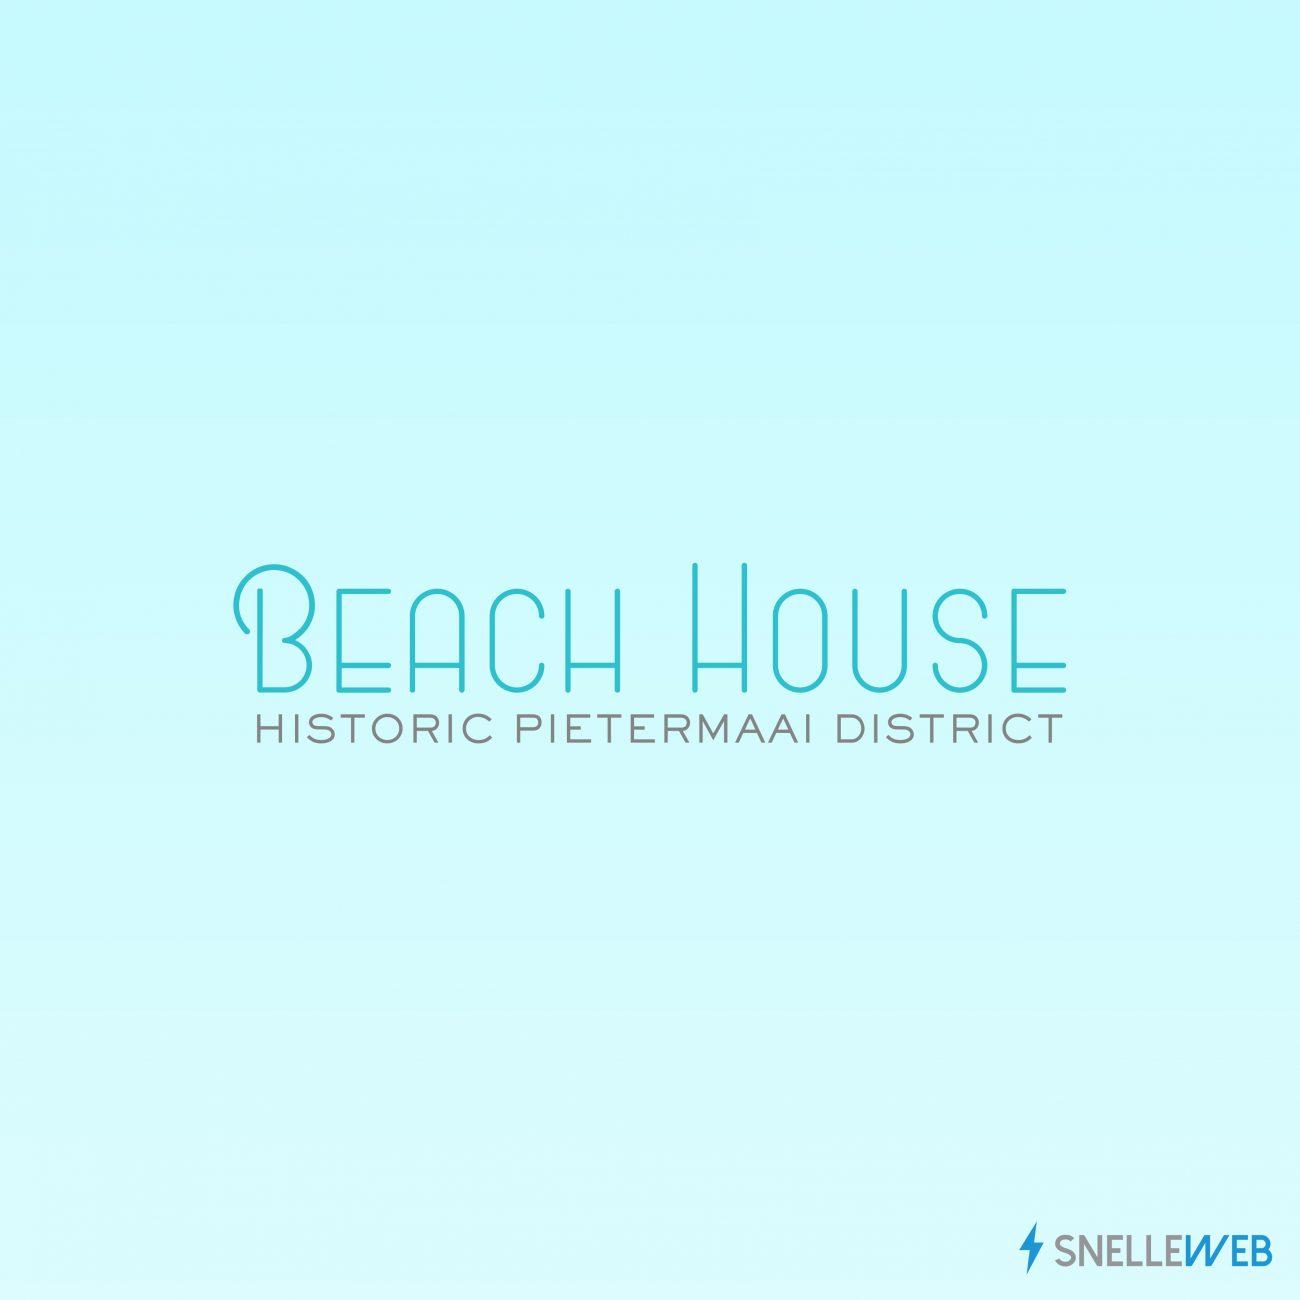 Beach house pietermaai